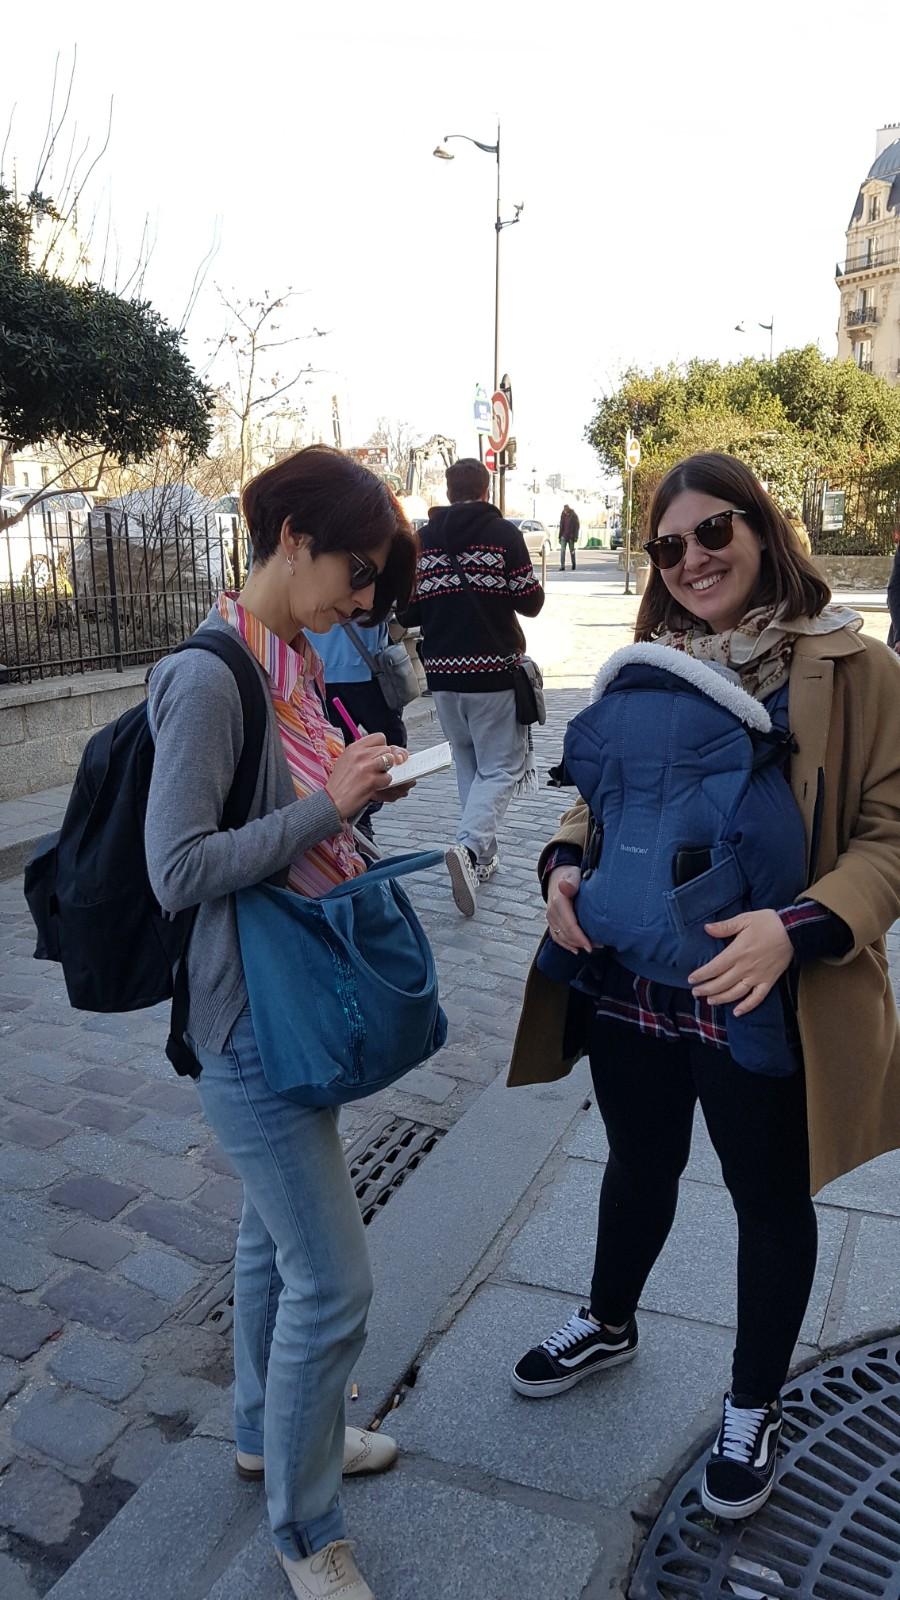 Livia & Flora Goldenberg - Both Jewish Tour guide in Paris